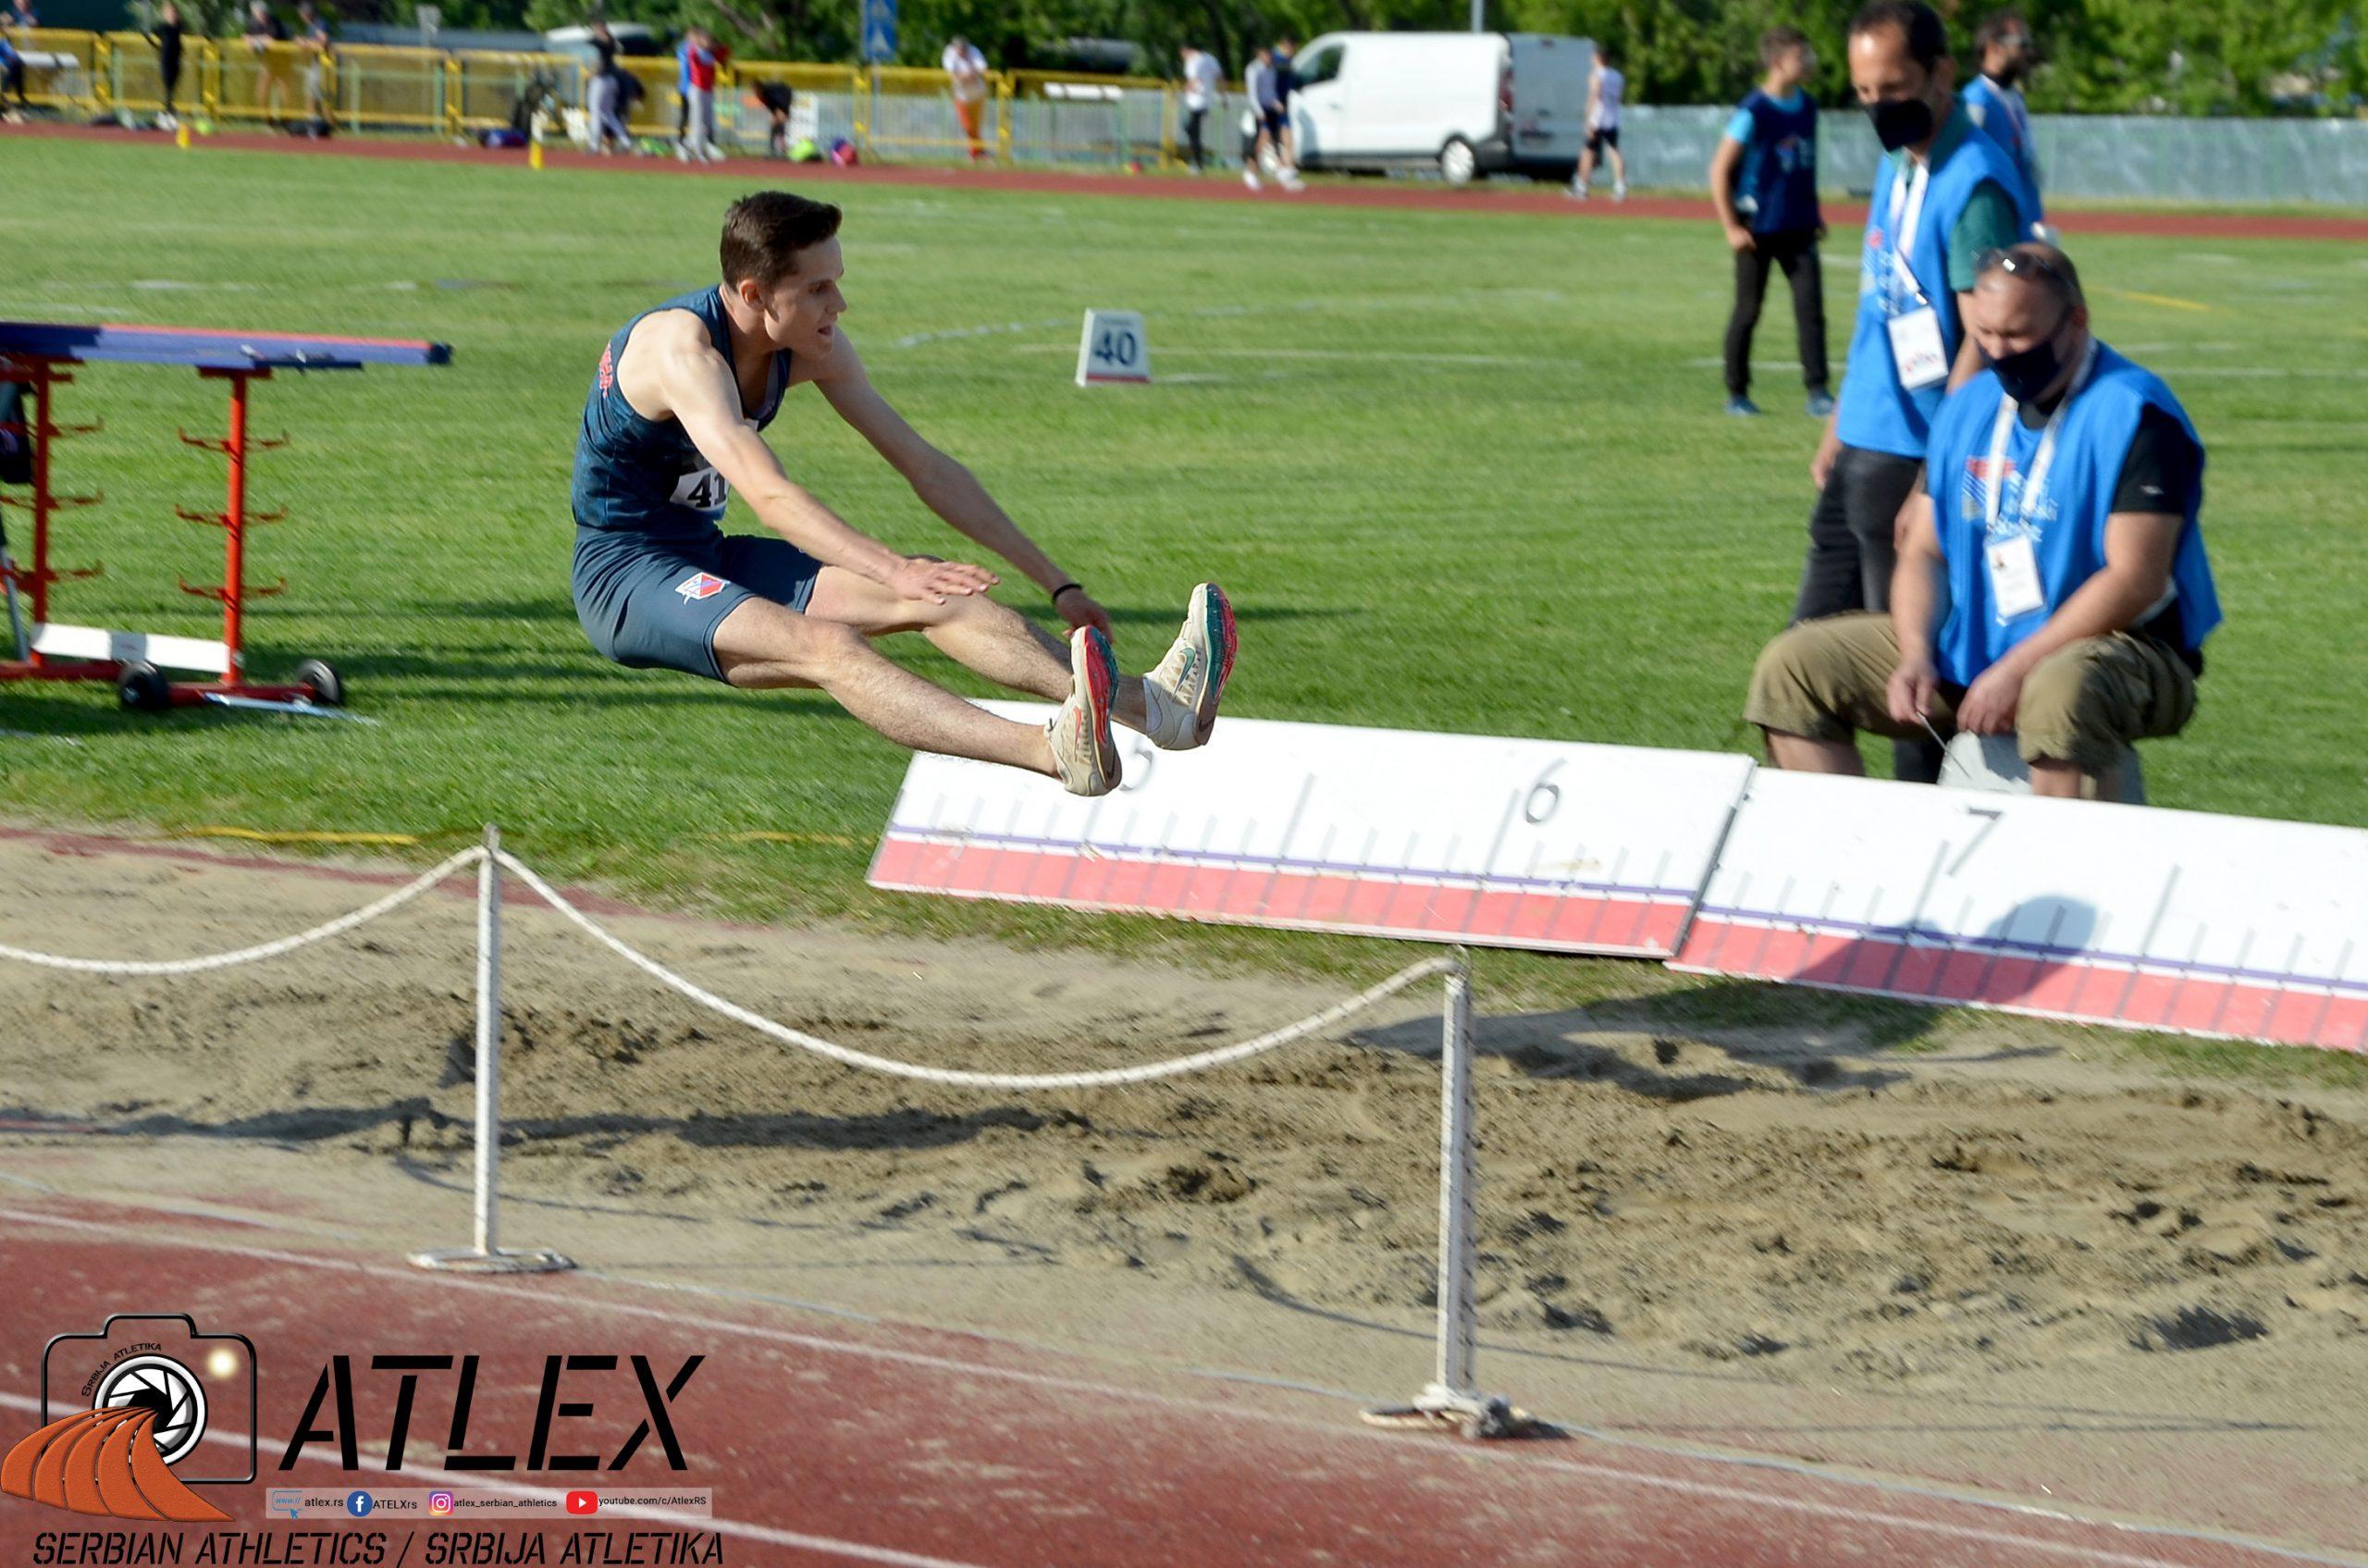 Petar Čanak, skok udalj, U20 prvenstvo Srbije 2021